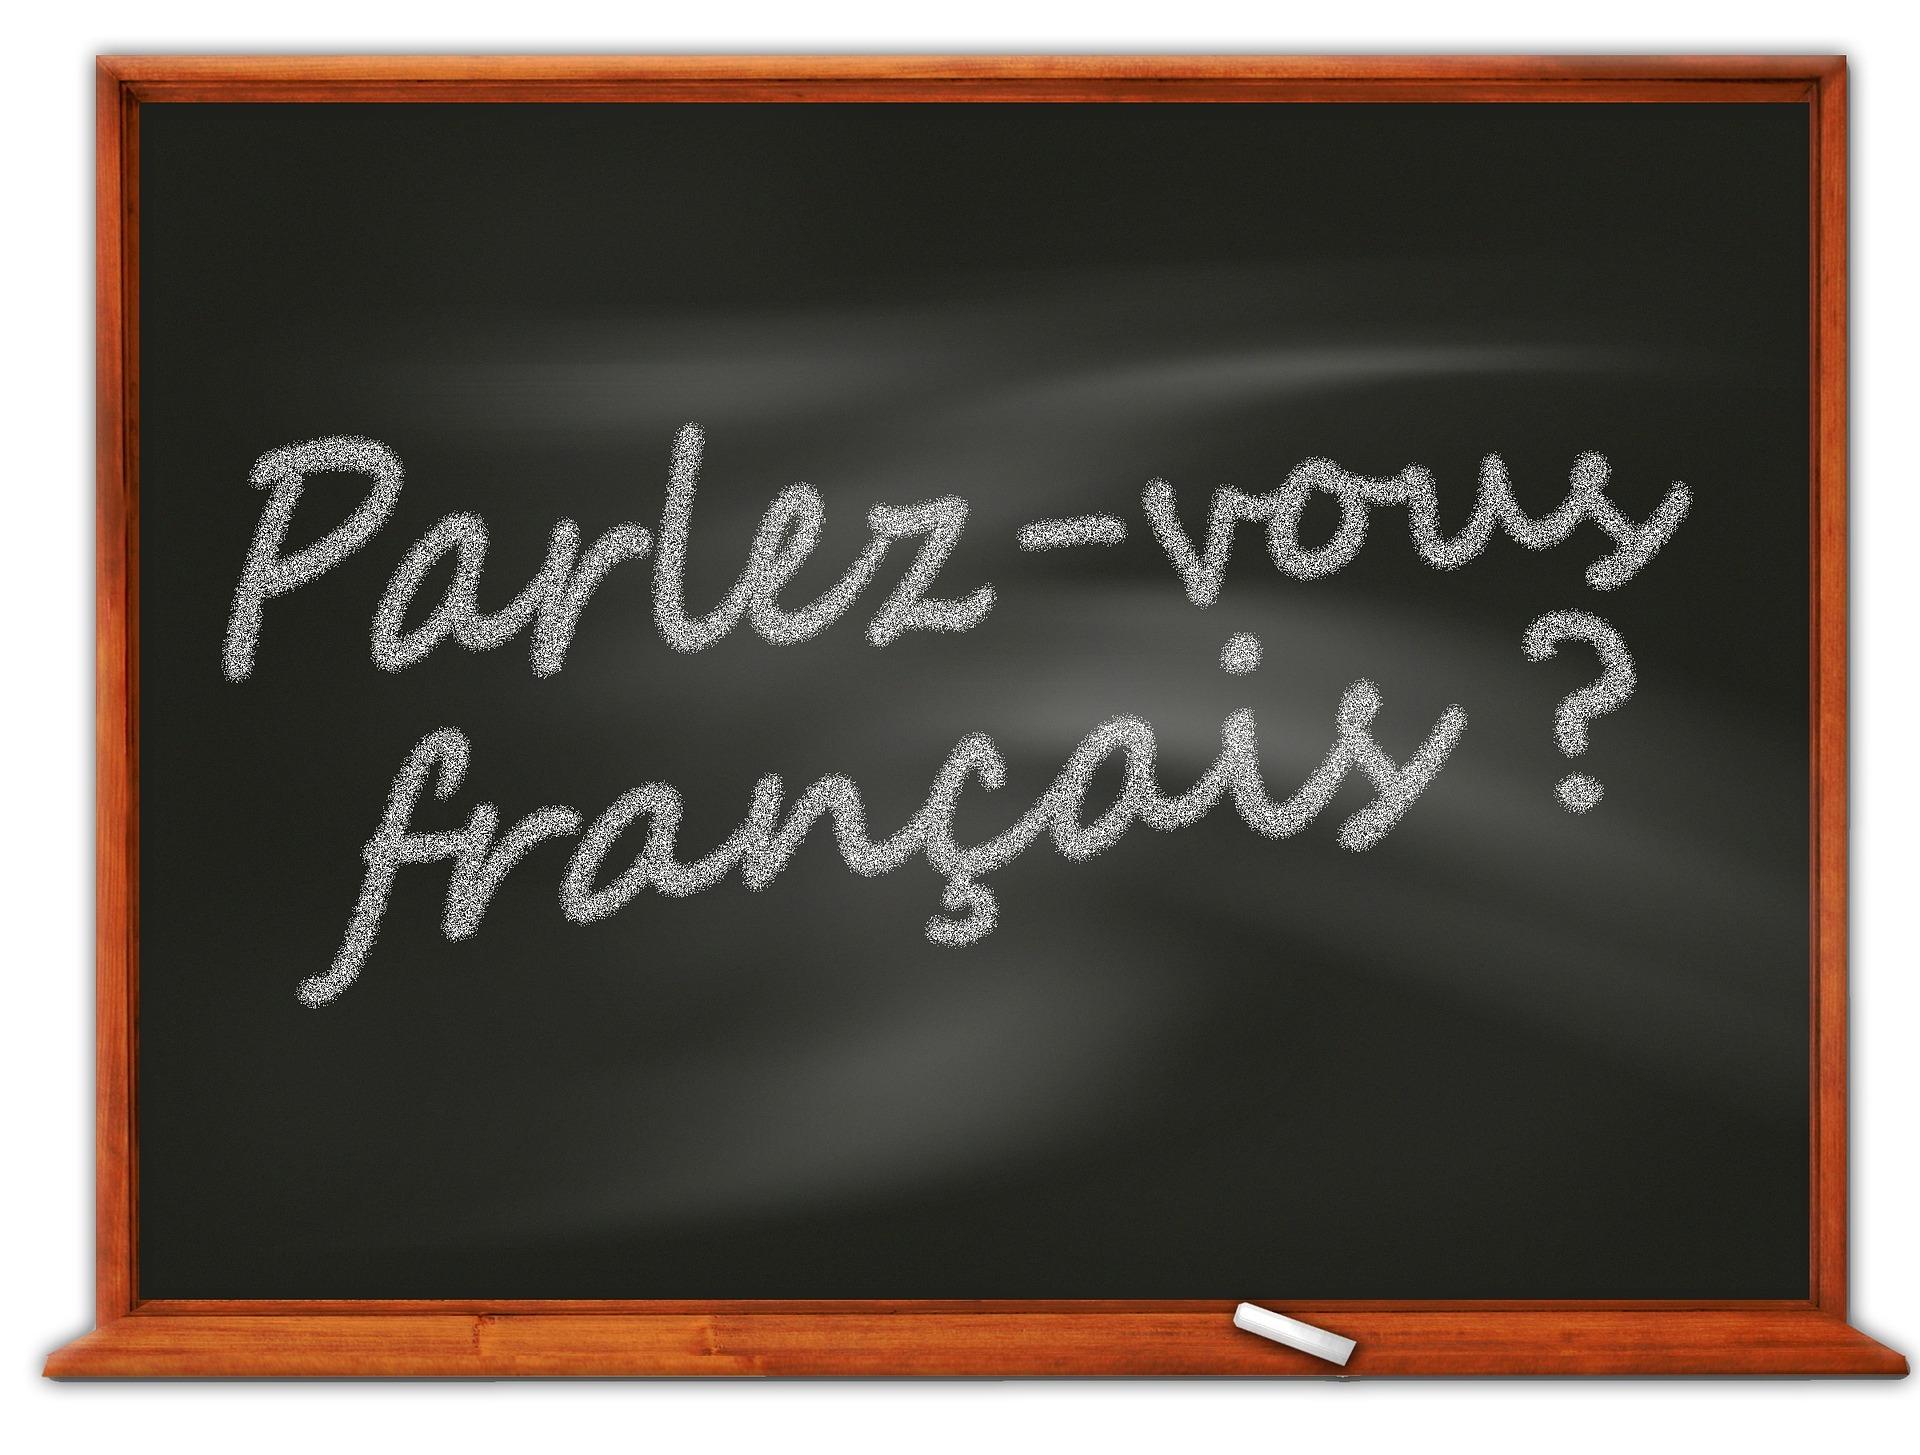 Francia nyelv - 2021